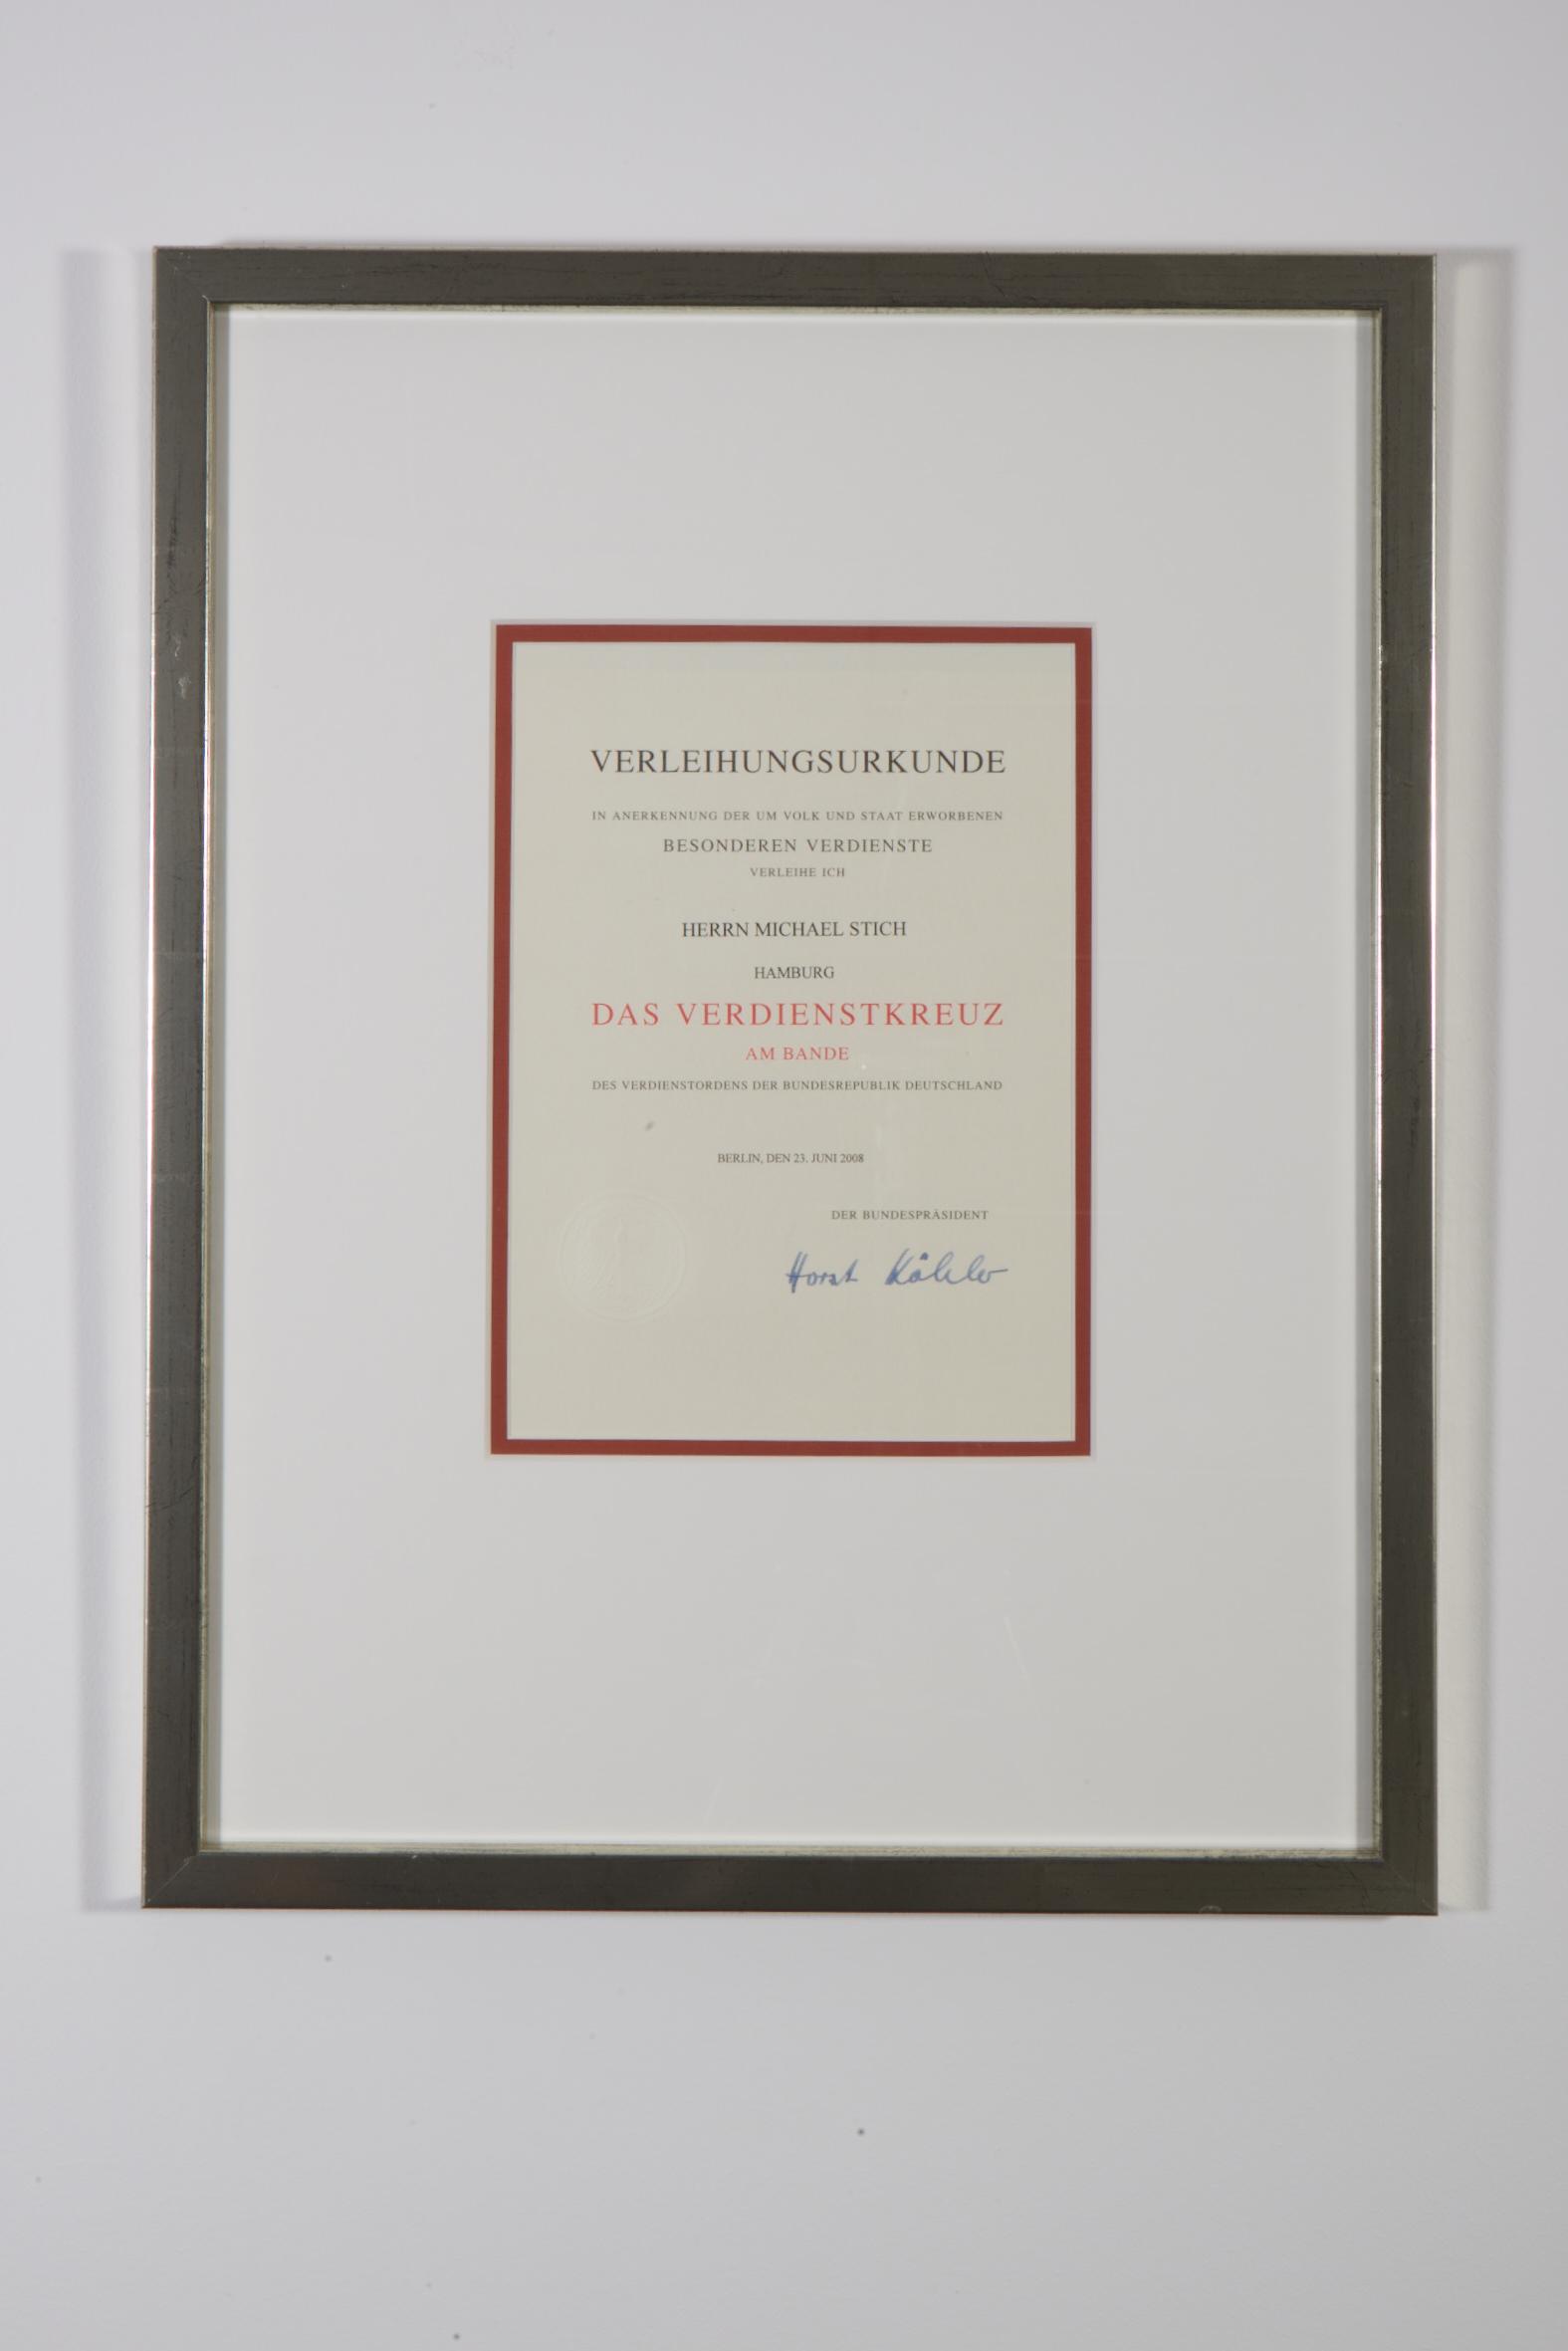 Bundesverdienstkreuz, 2008